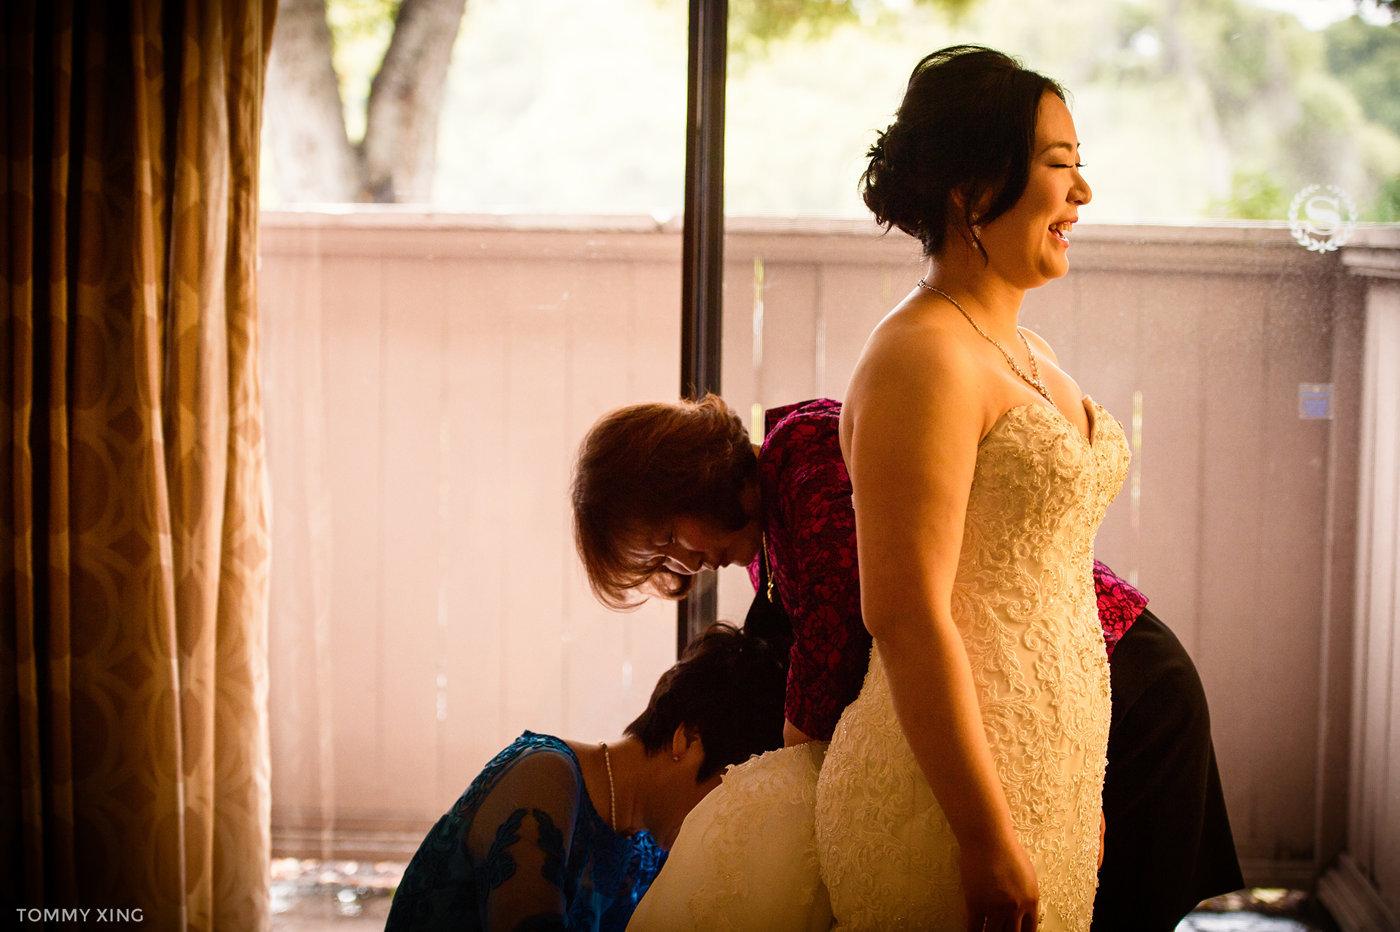 STANFORD MEMORIAL CHURCH WEDDING - Wenjie & Chengcheng - SAN FRANCISCO BAY AREA 斯坦福教堂婚礼跟拍 - 洛杉矶婚礼婚纱照摄影师 Tommy Xing Photography038.jpg